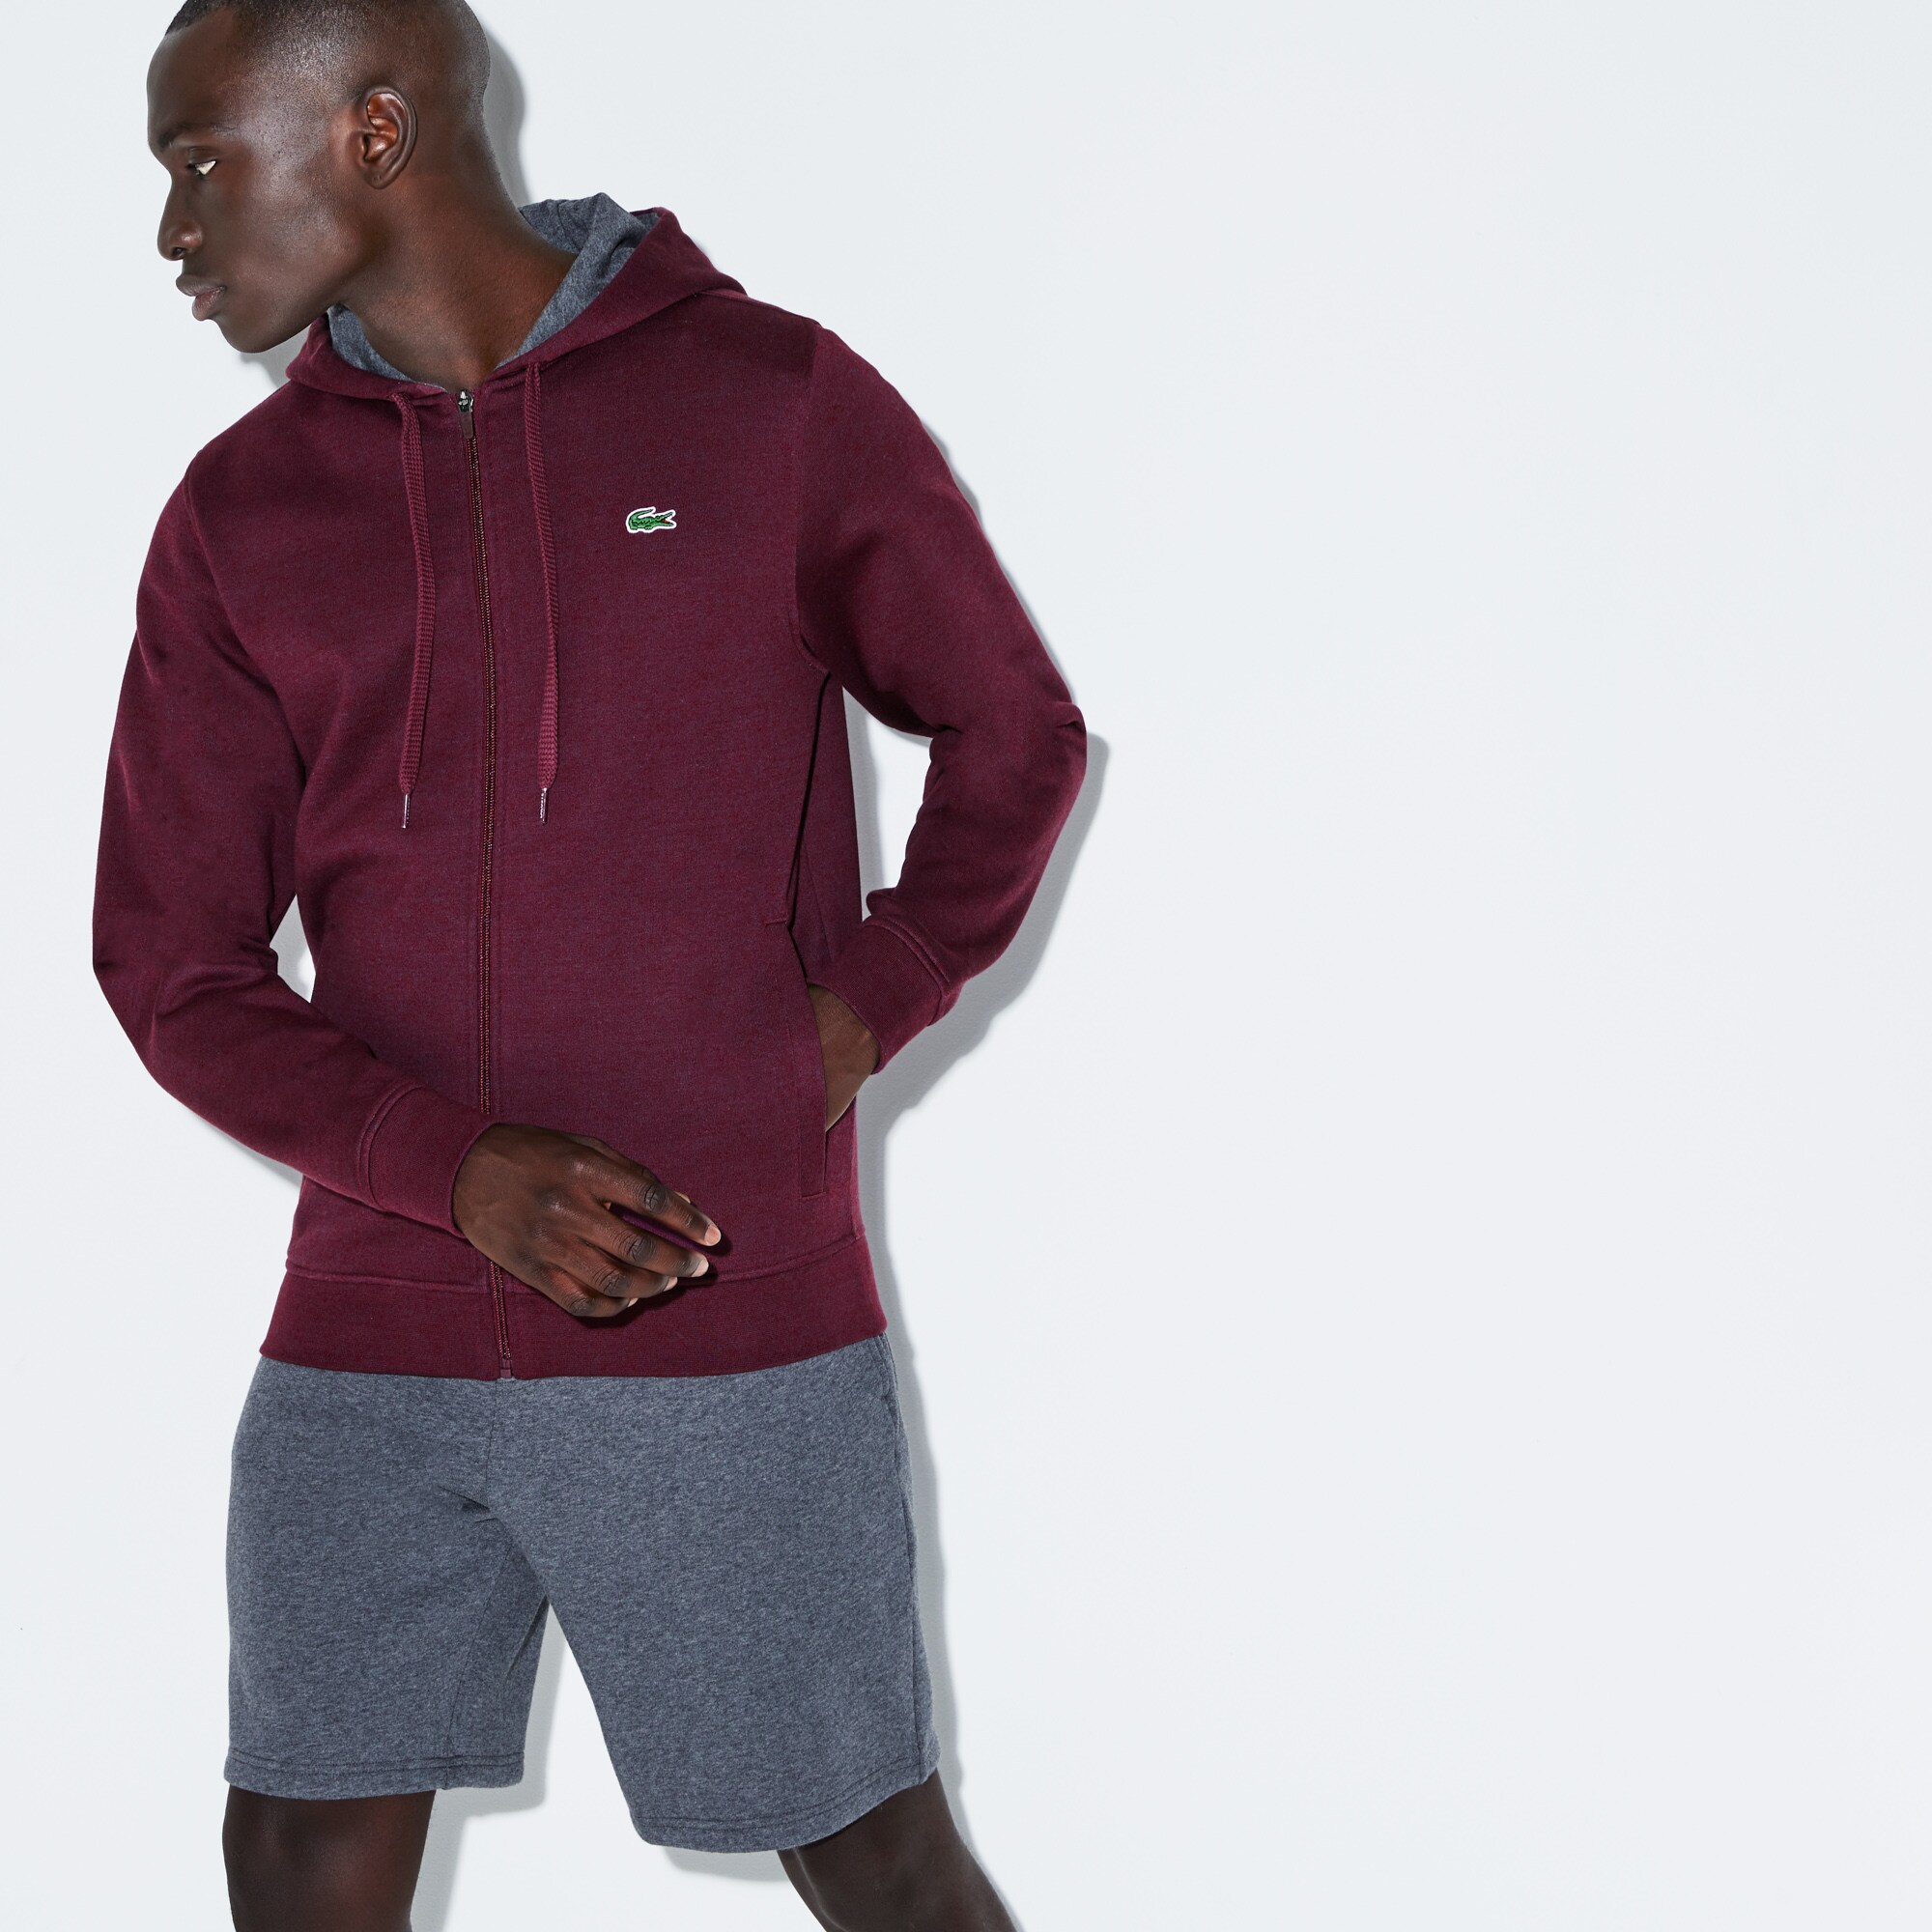 Felpa Lacoste Tennis con zip e cappuccio in cotone in tinta unita